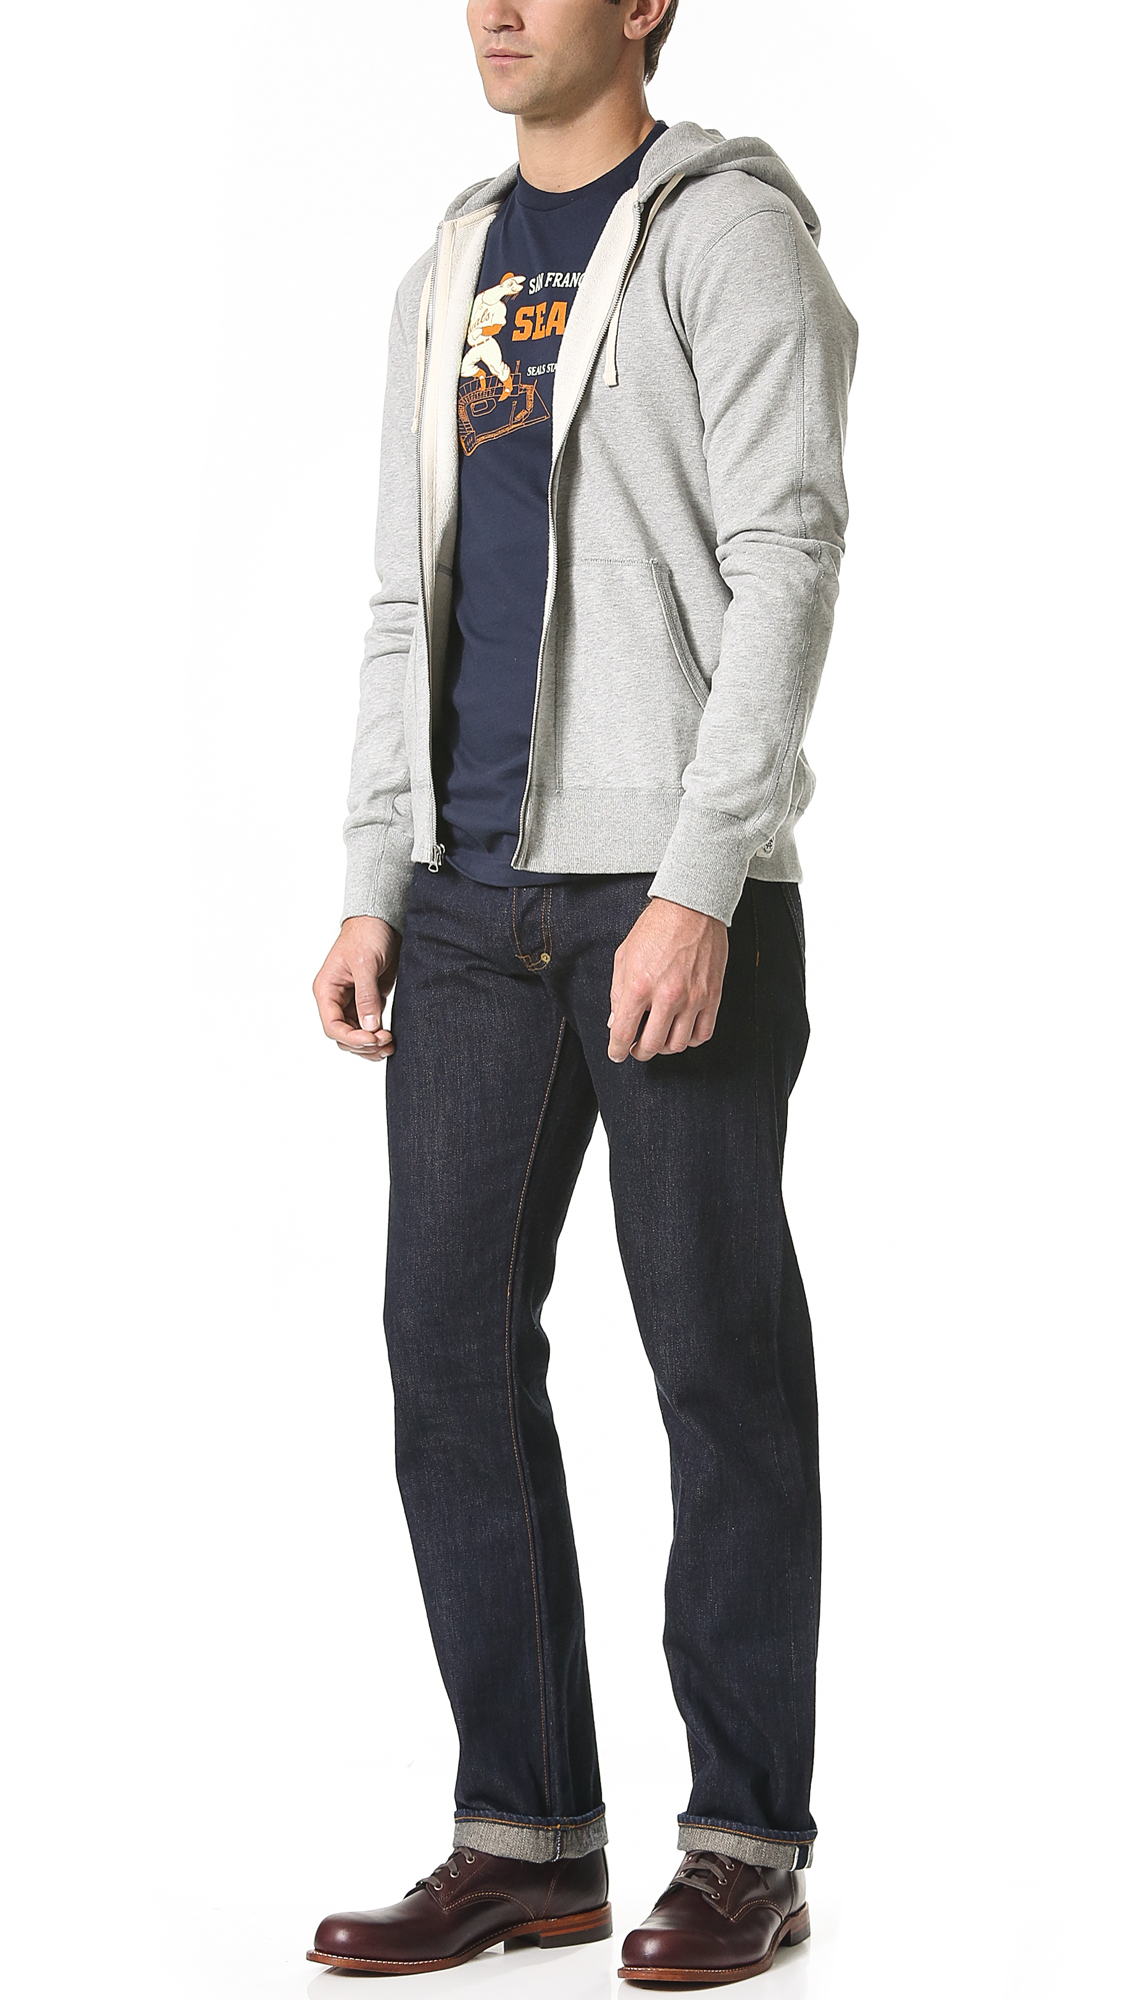 Ebbets Field Flannels Sf Seals Tshirt in Navy (Blue) for Men